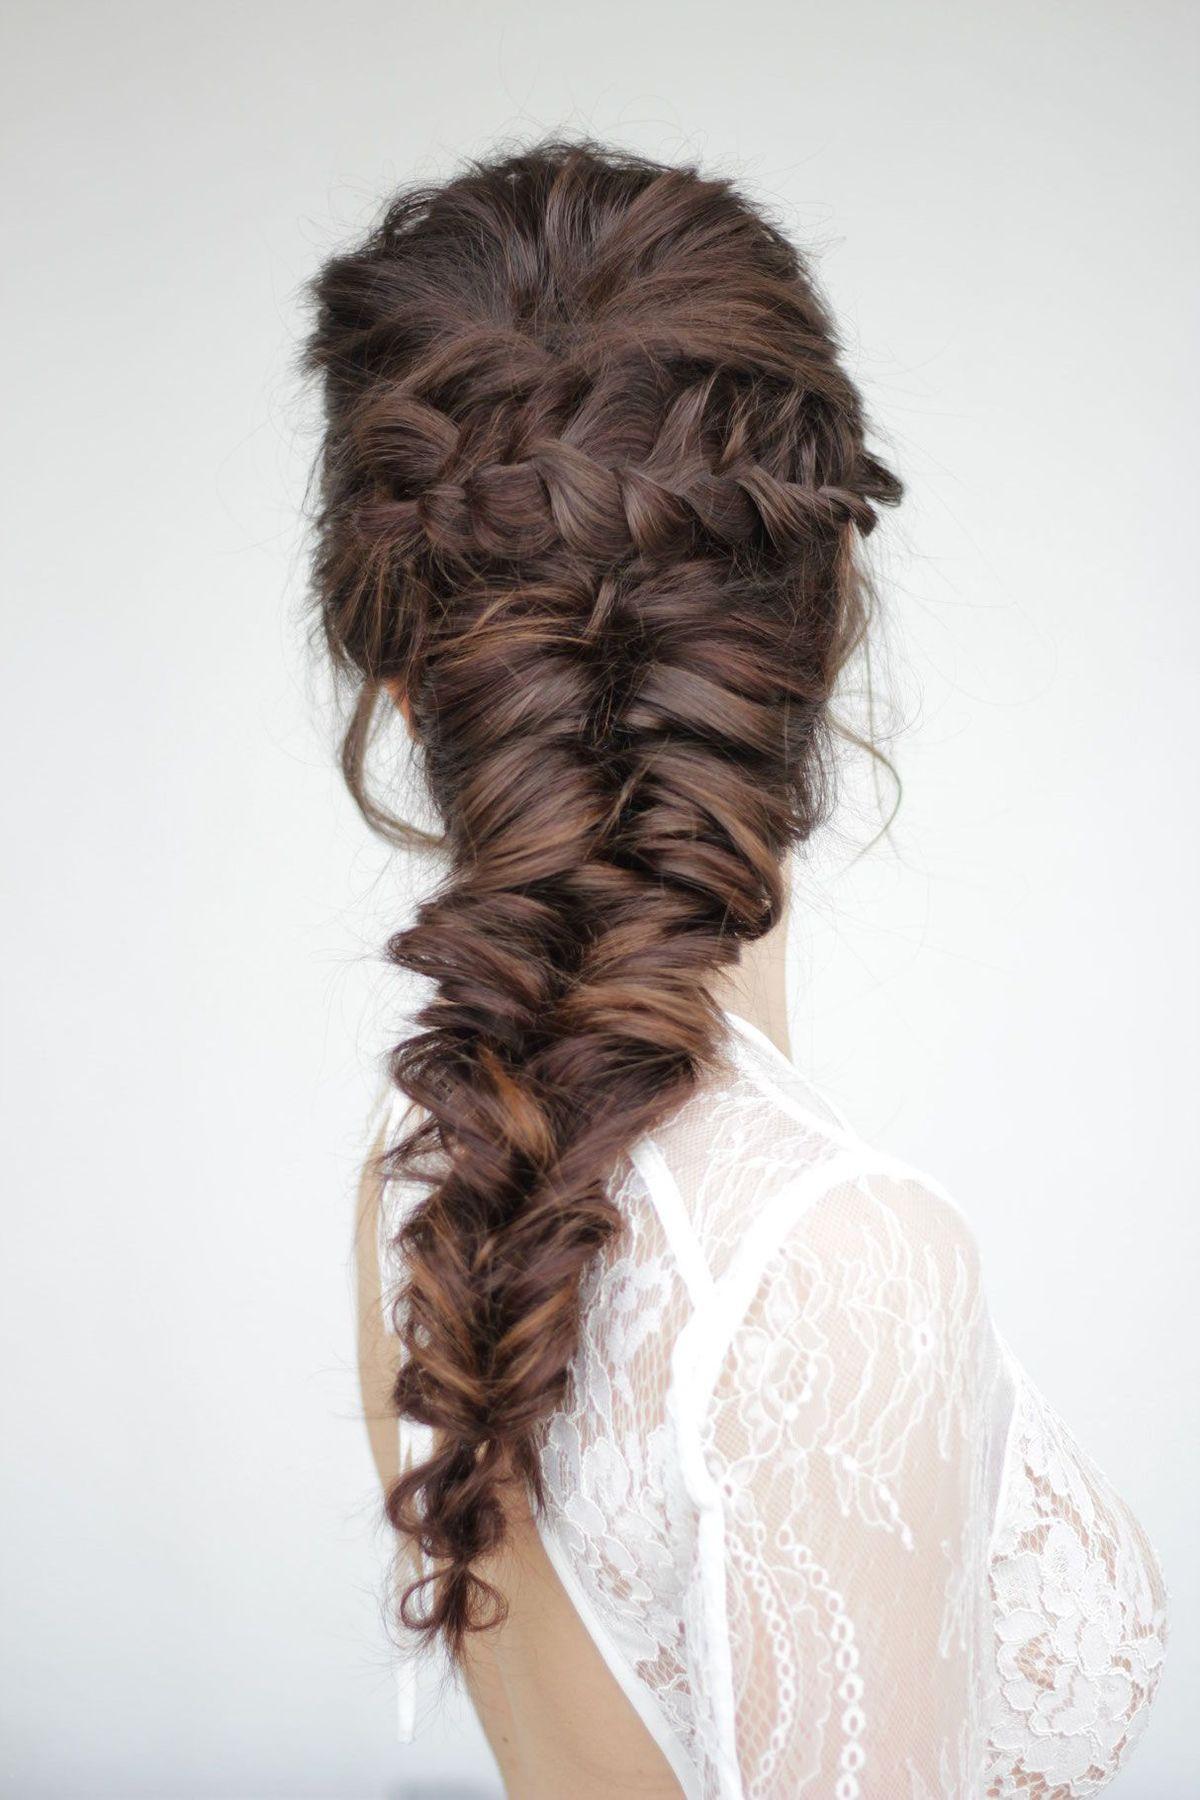 Hair Inspiration 2019-03-29 16:51:47